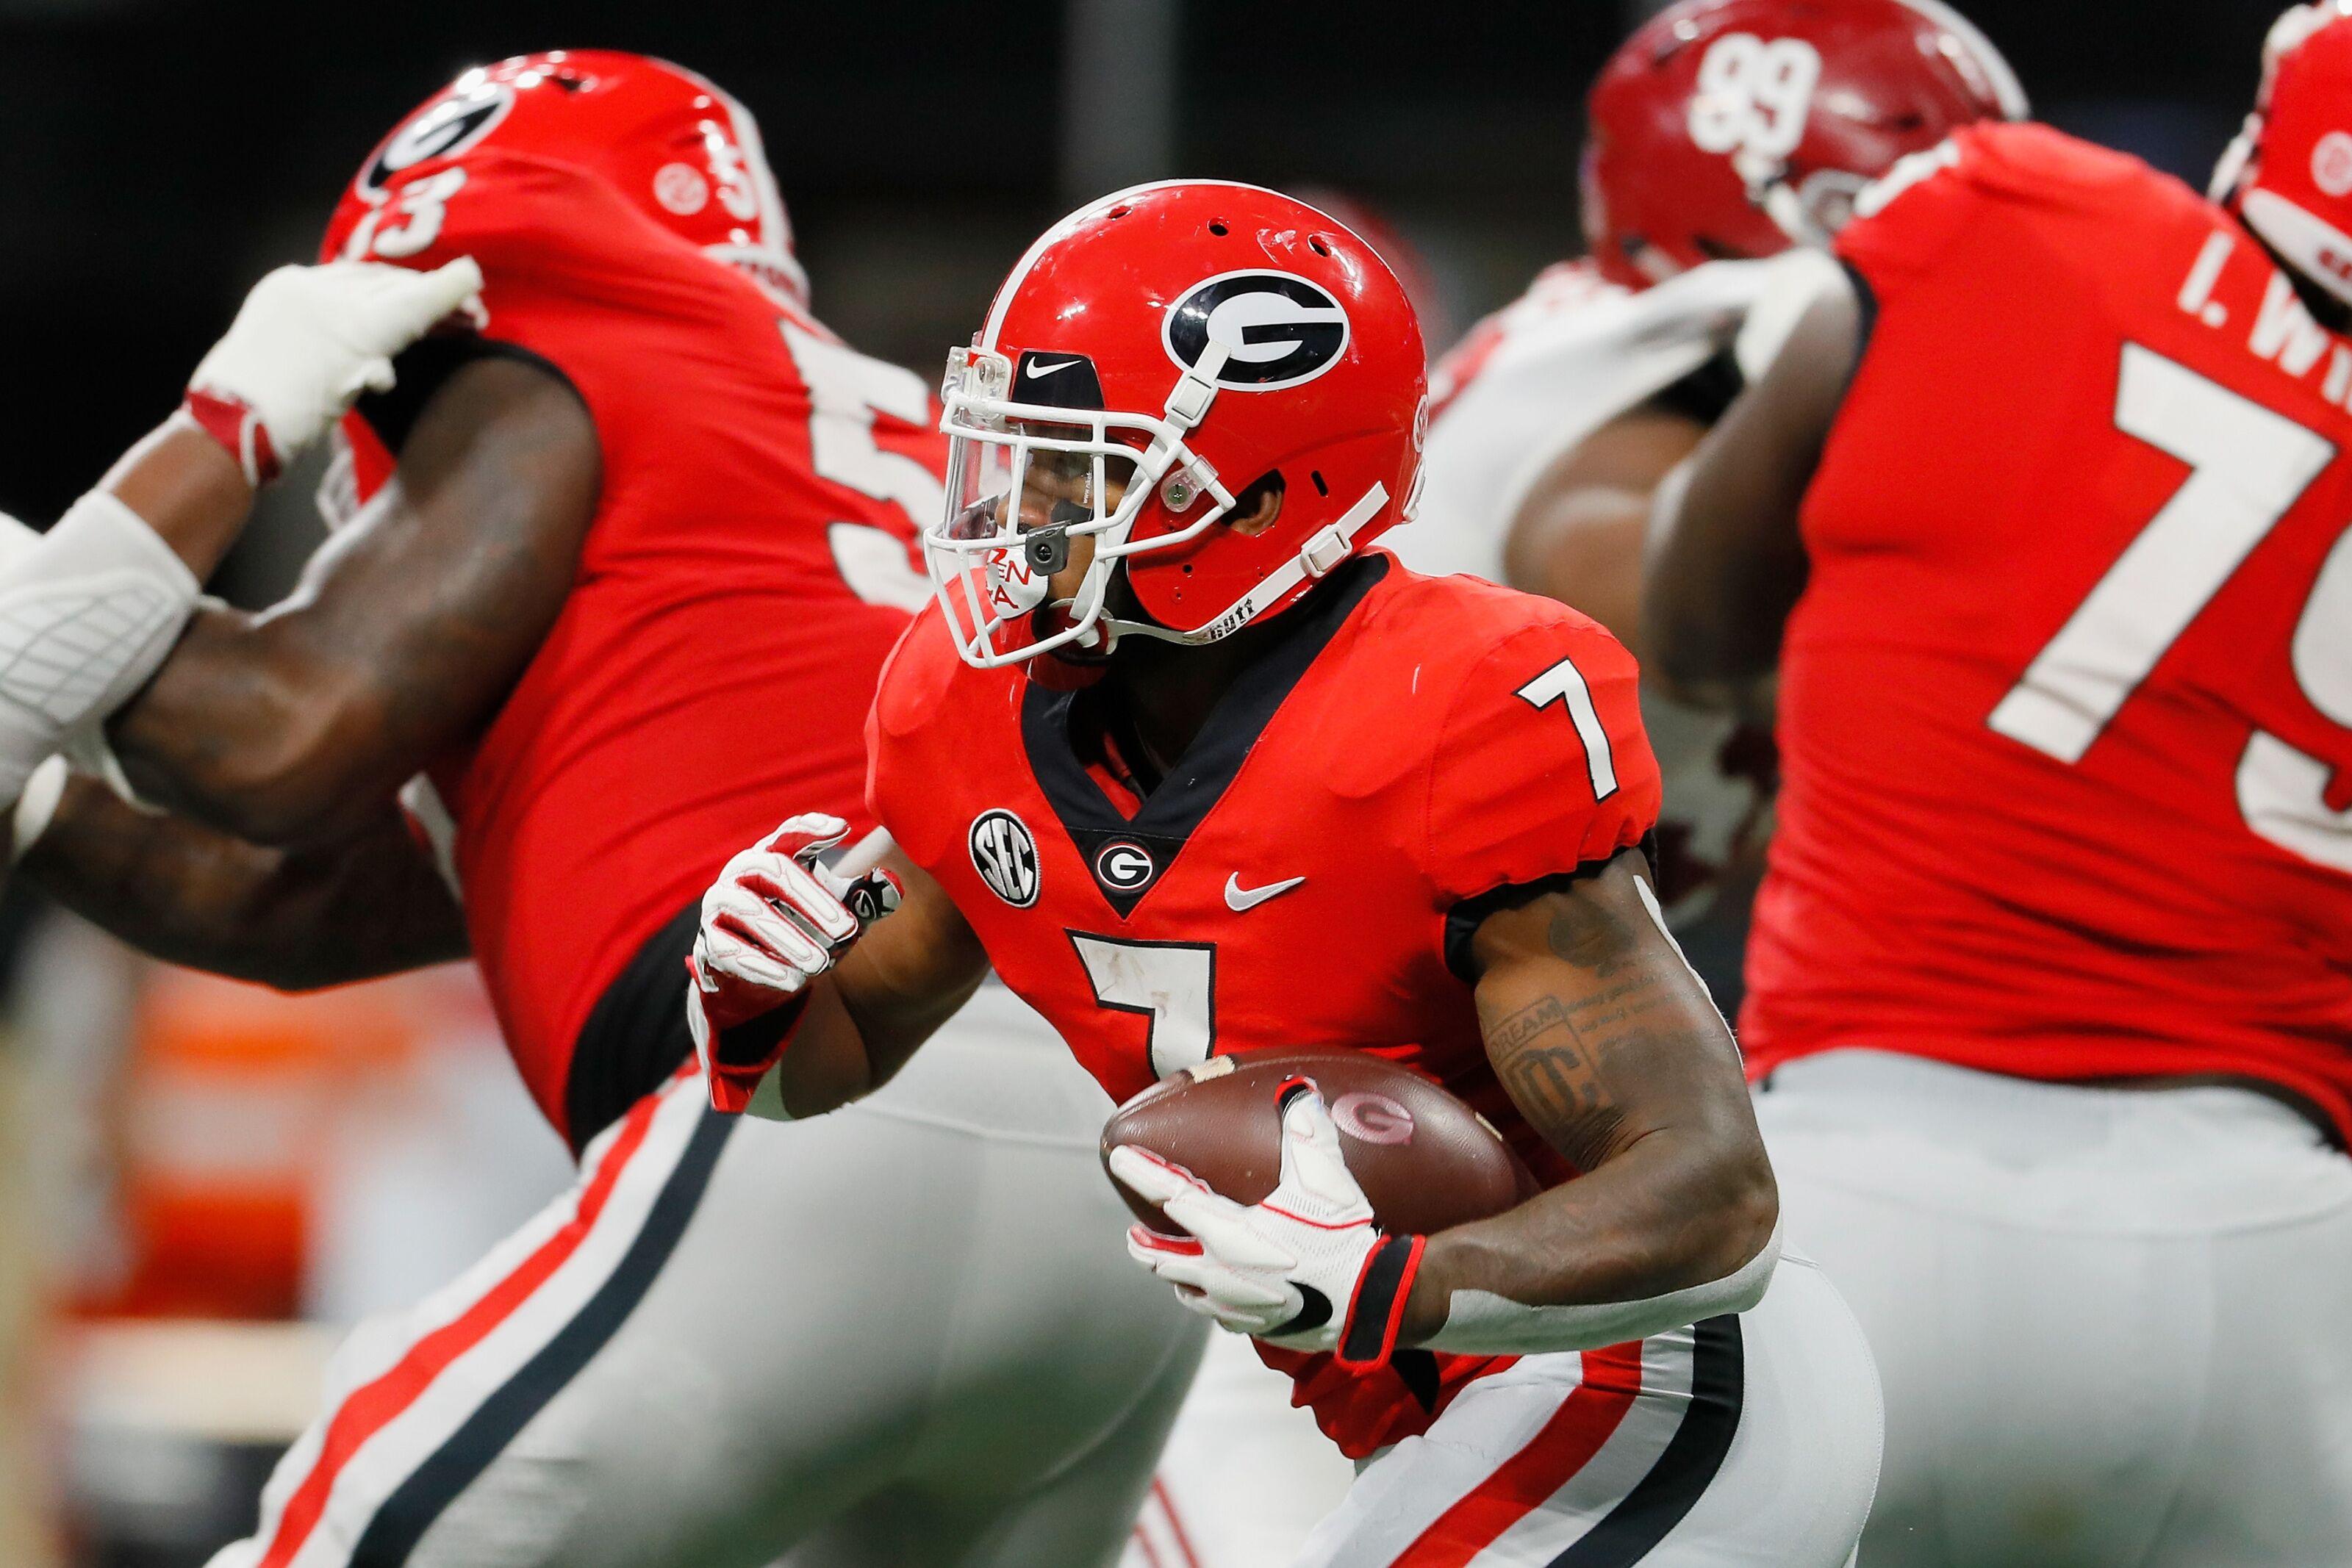 Georgia Football's 2020 early NFL draft grades impress